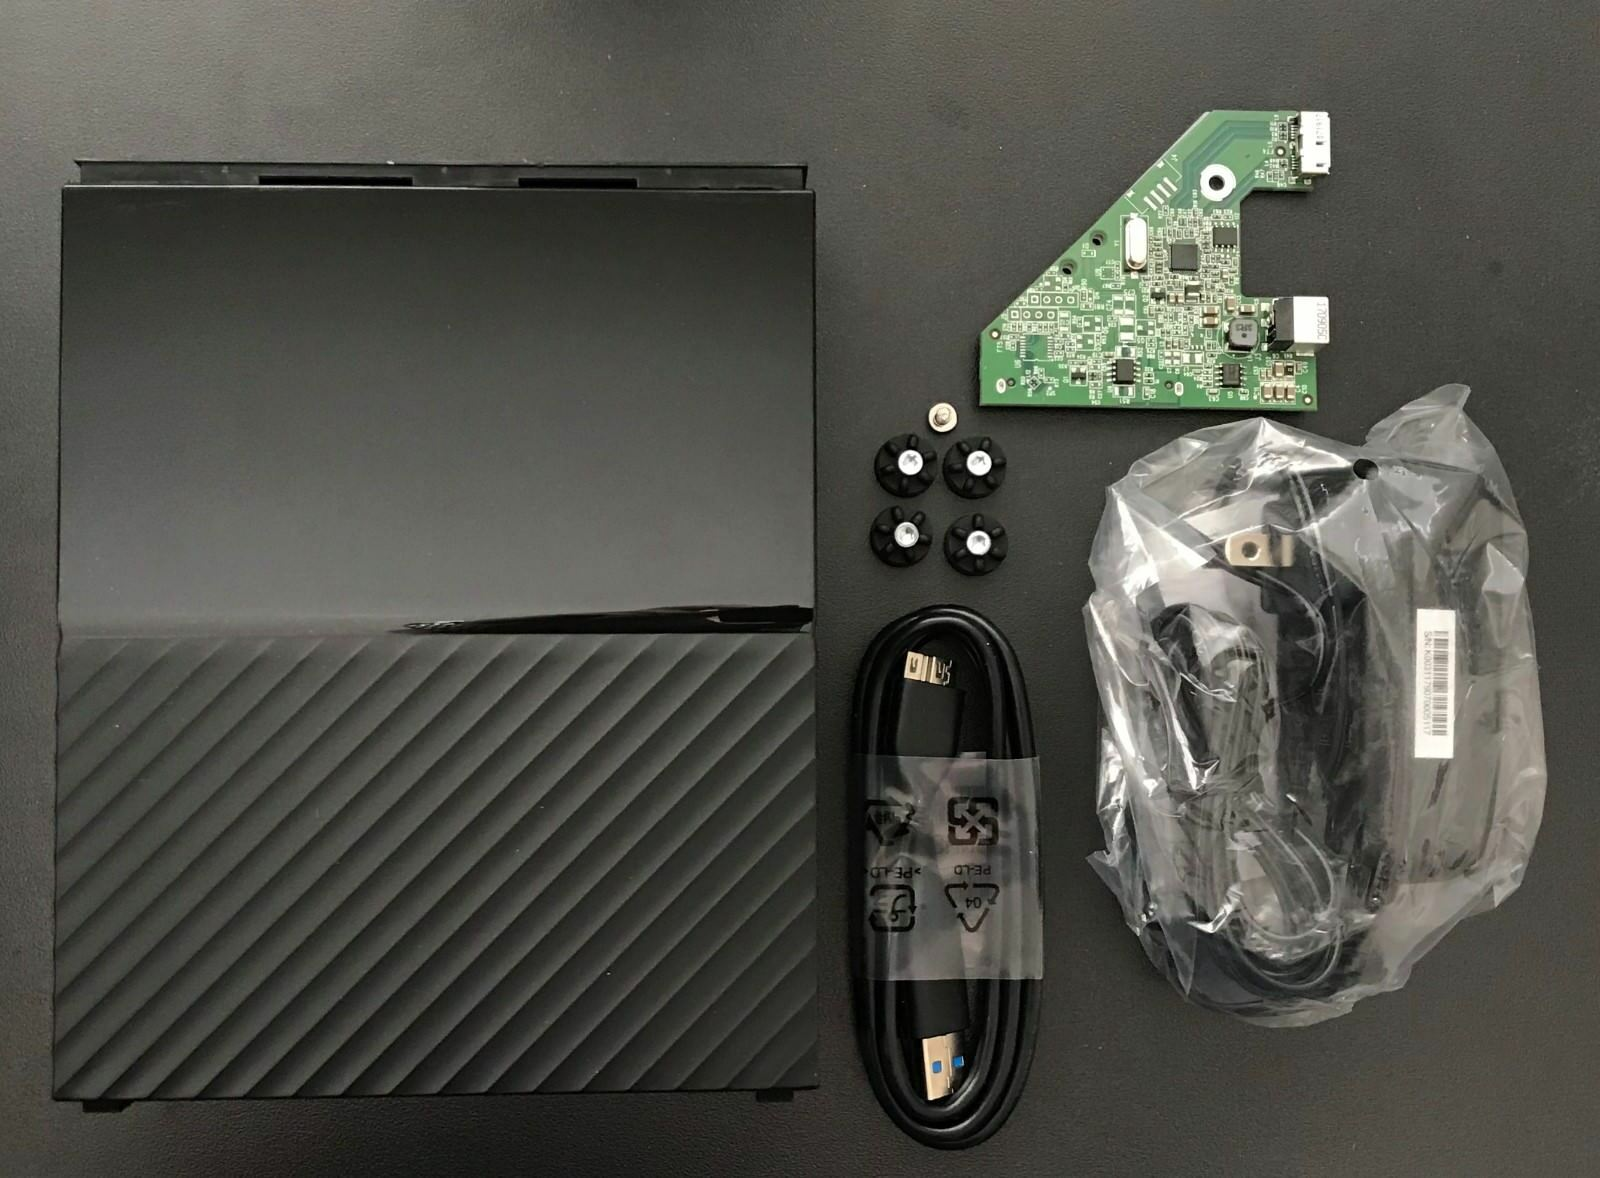 Western Digital WD Elements Desktop USB 3.0 External SATA Hard Drive Enclosure